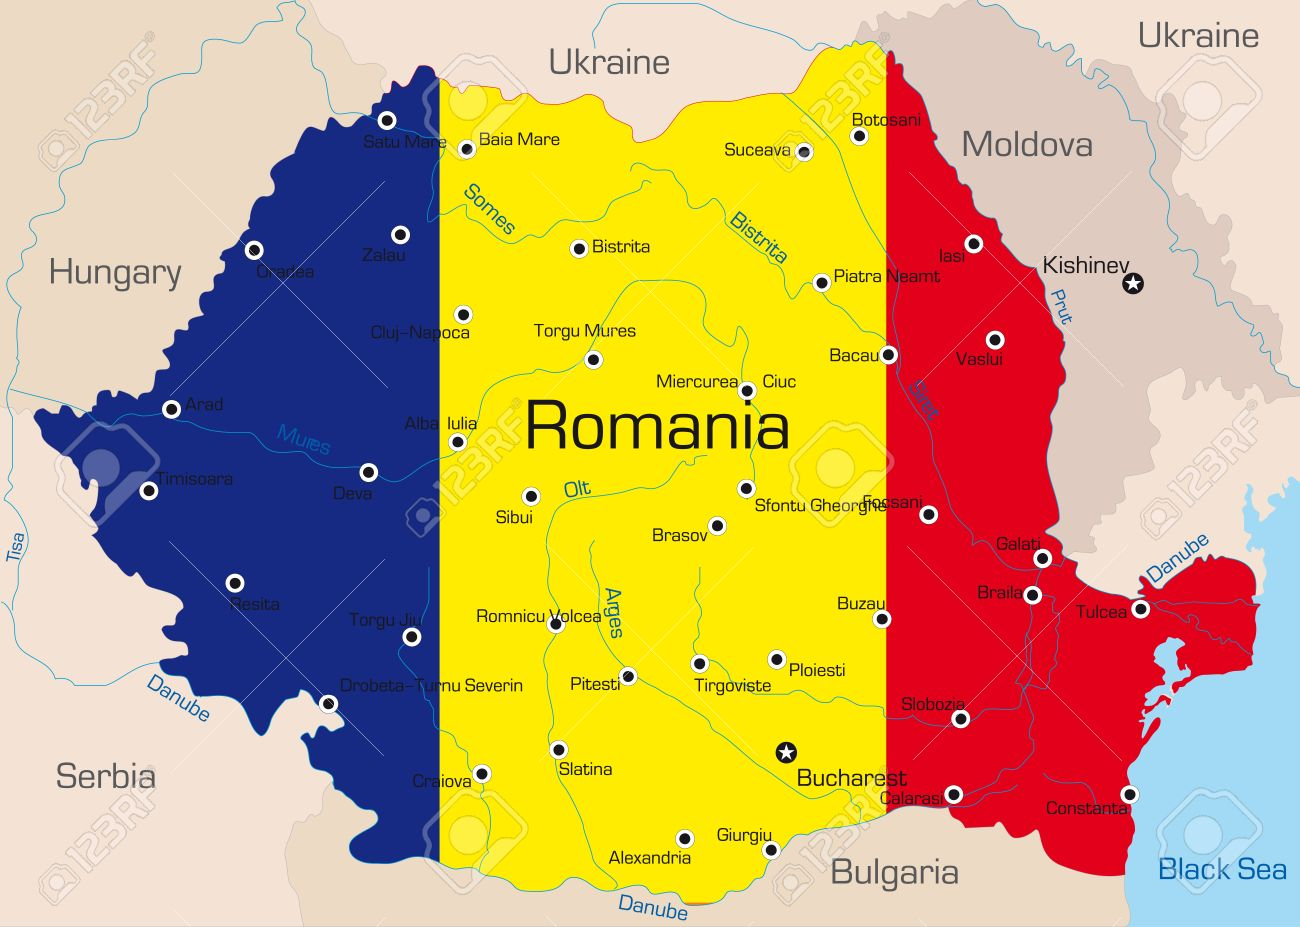 такси Украина - Румыния, междугороднее такси